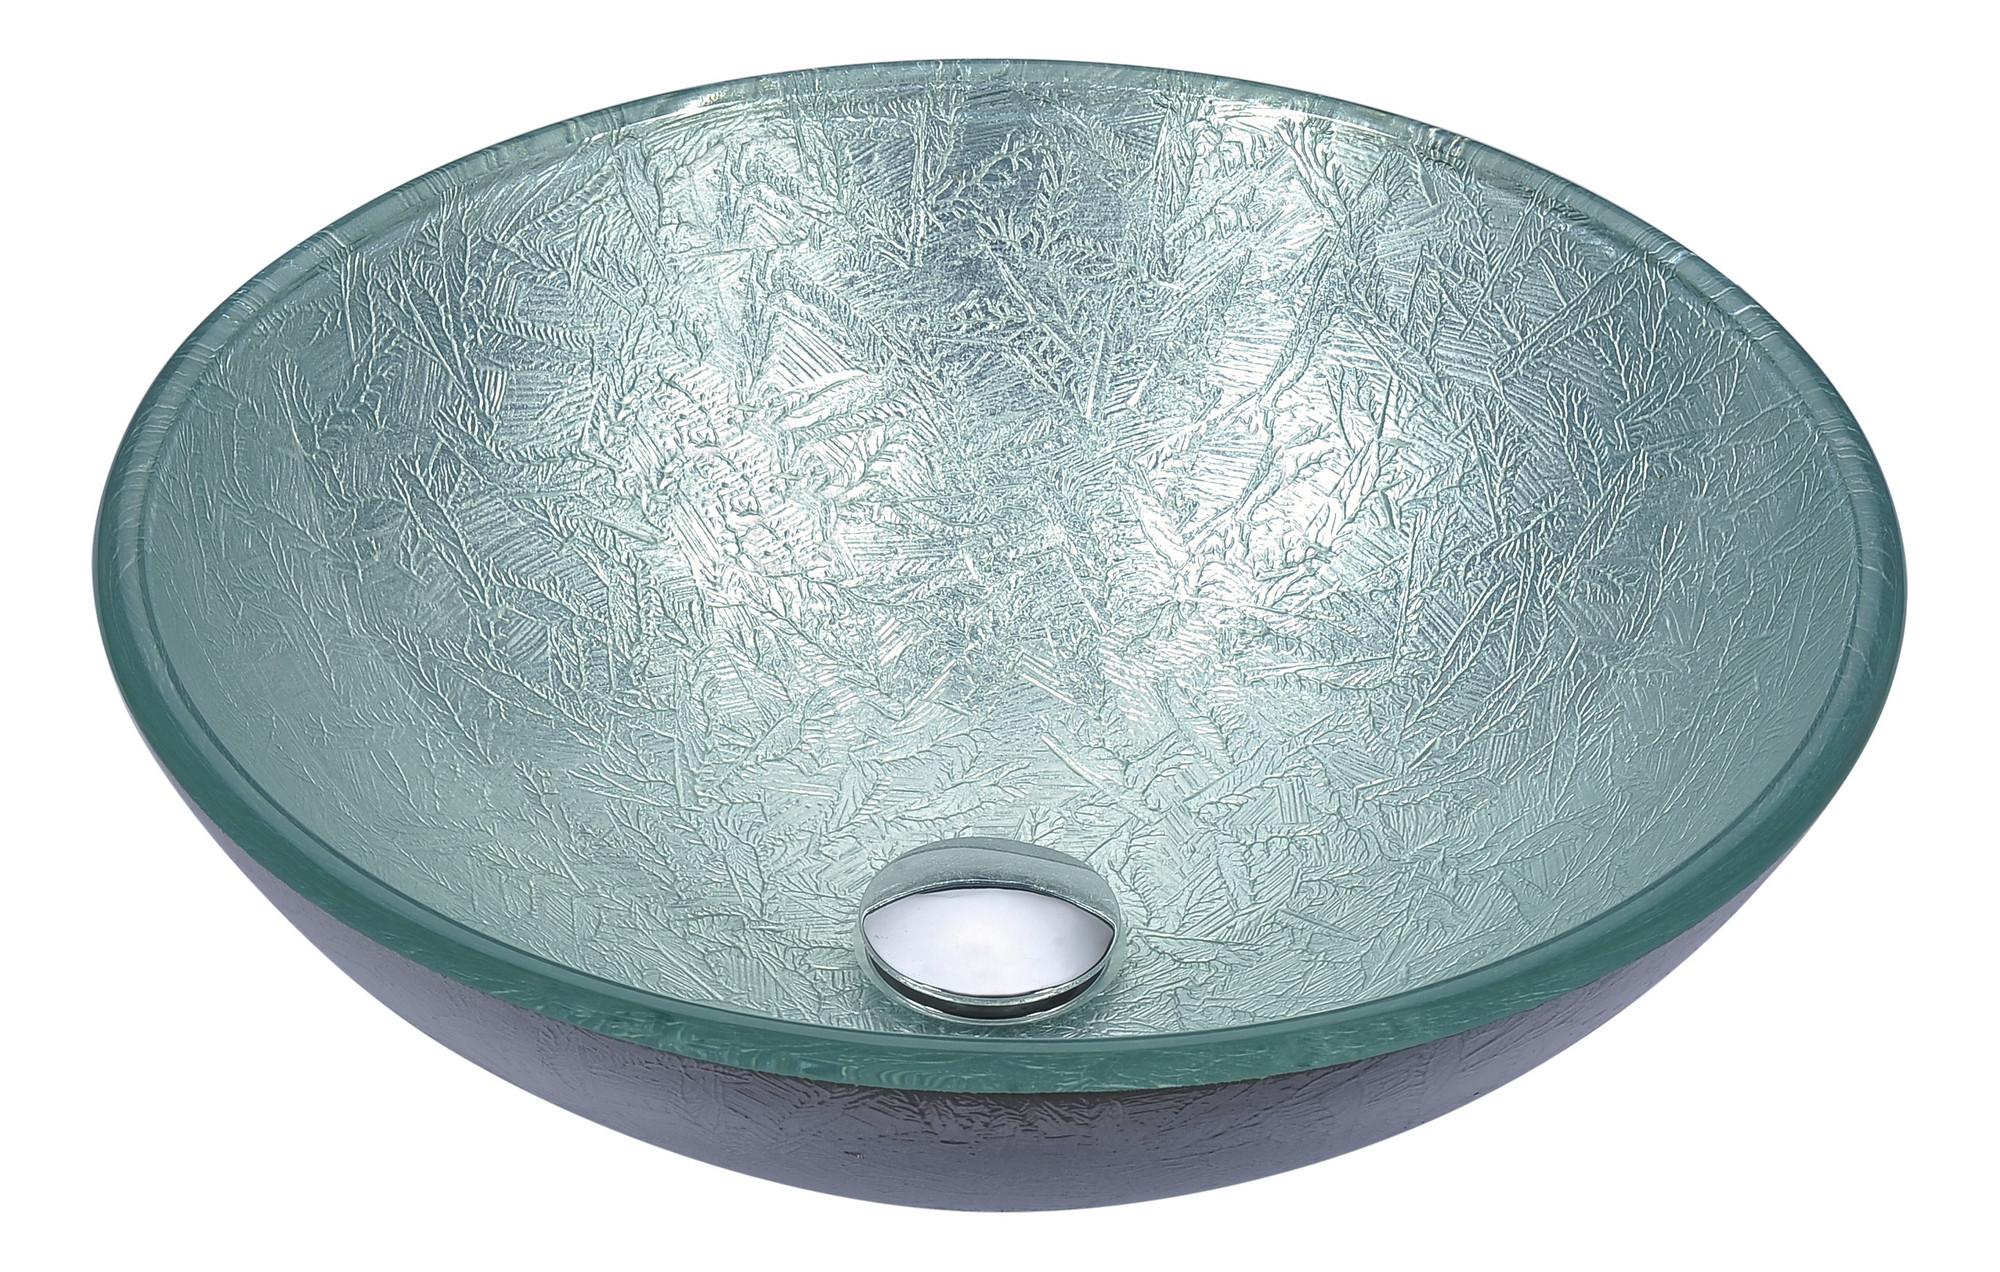 ANZZI LS-AZ296 Posh Series Deco-Glass Vessel Sink In Glacial Silver